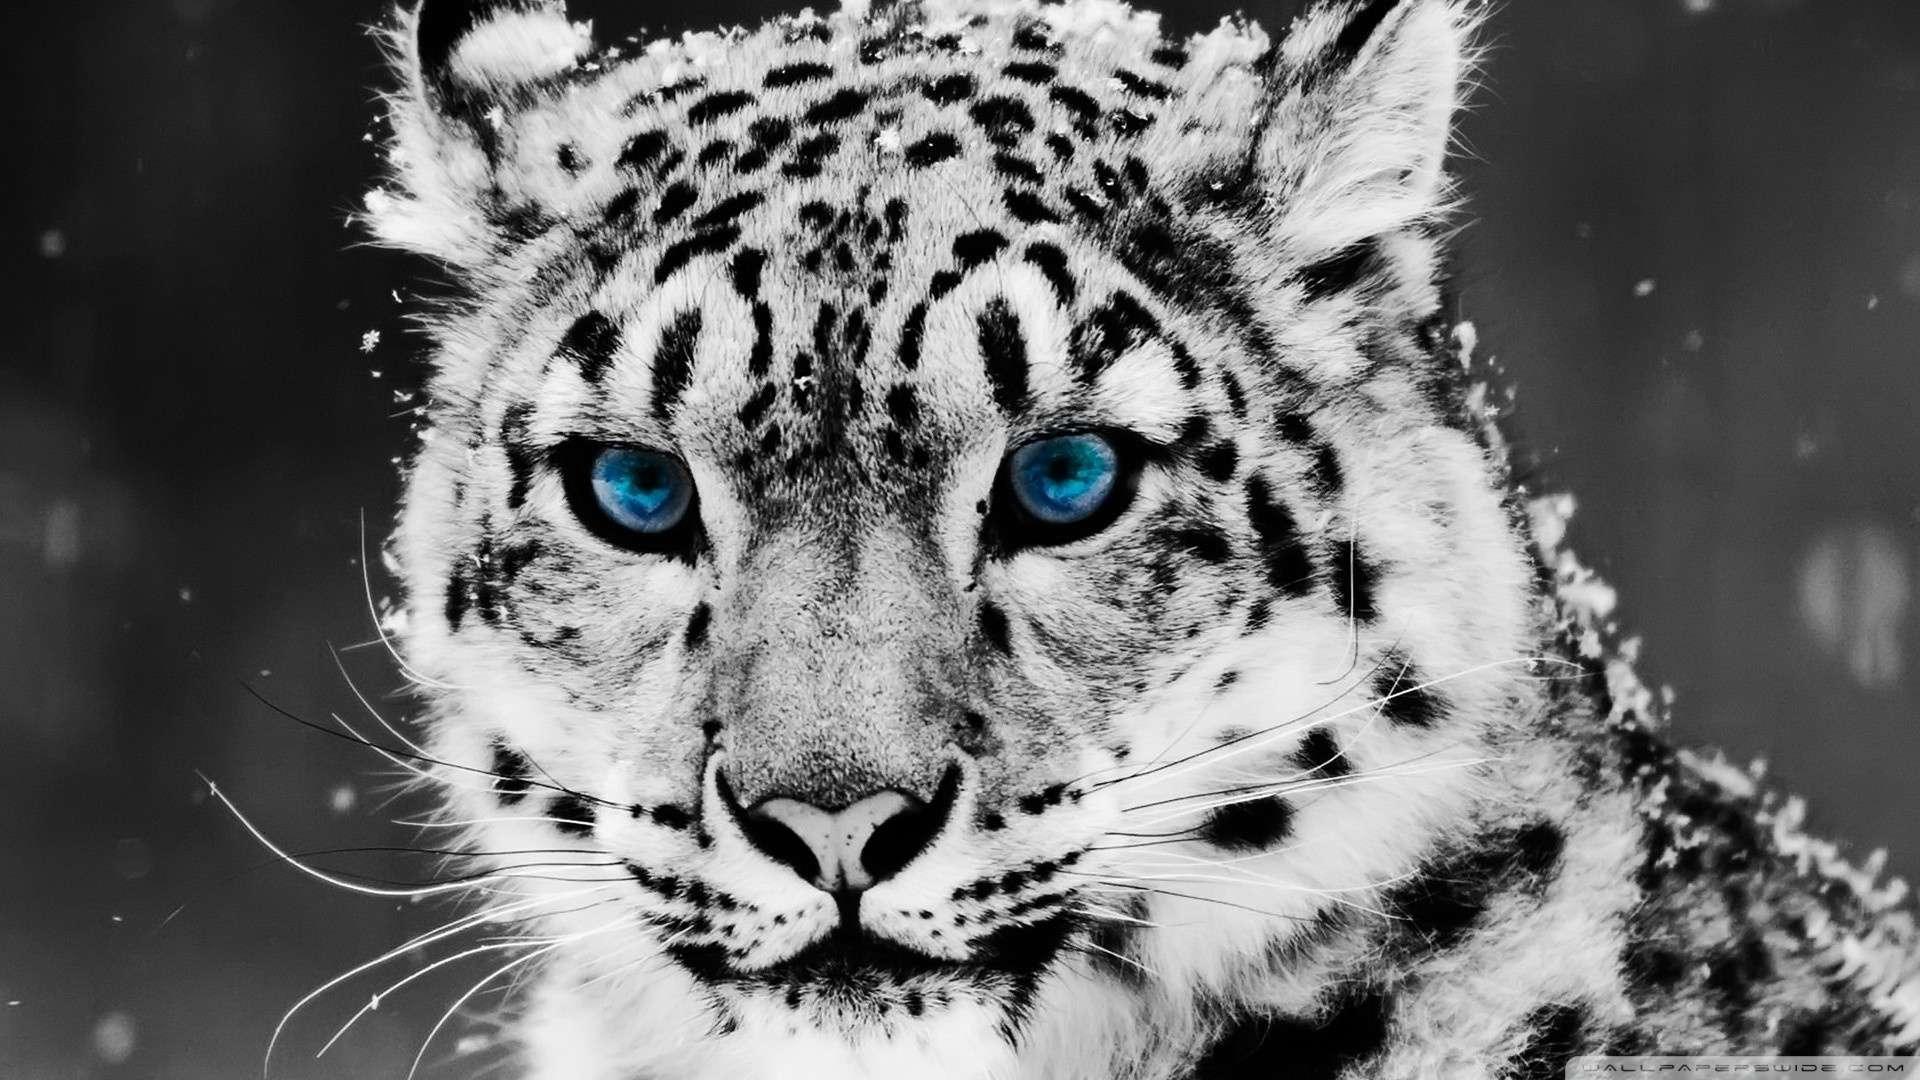 Wallpaper Snow Leopard Black And White Portrait Wallpaper 1080p HD 1920x1080